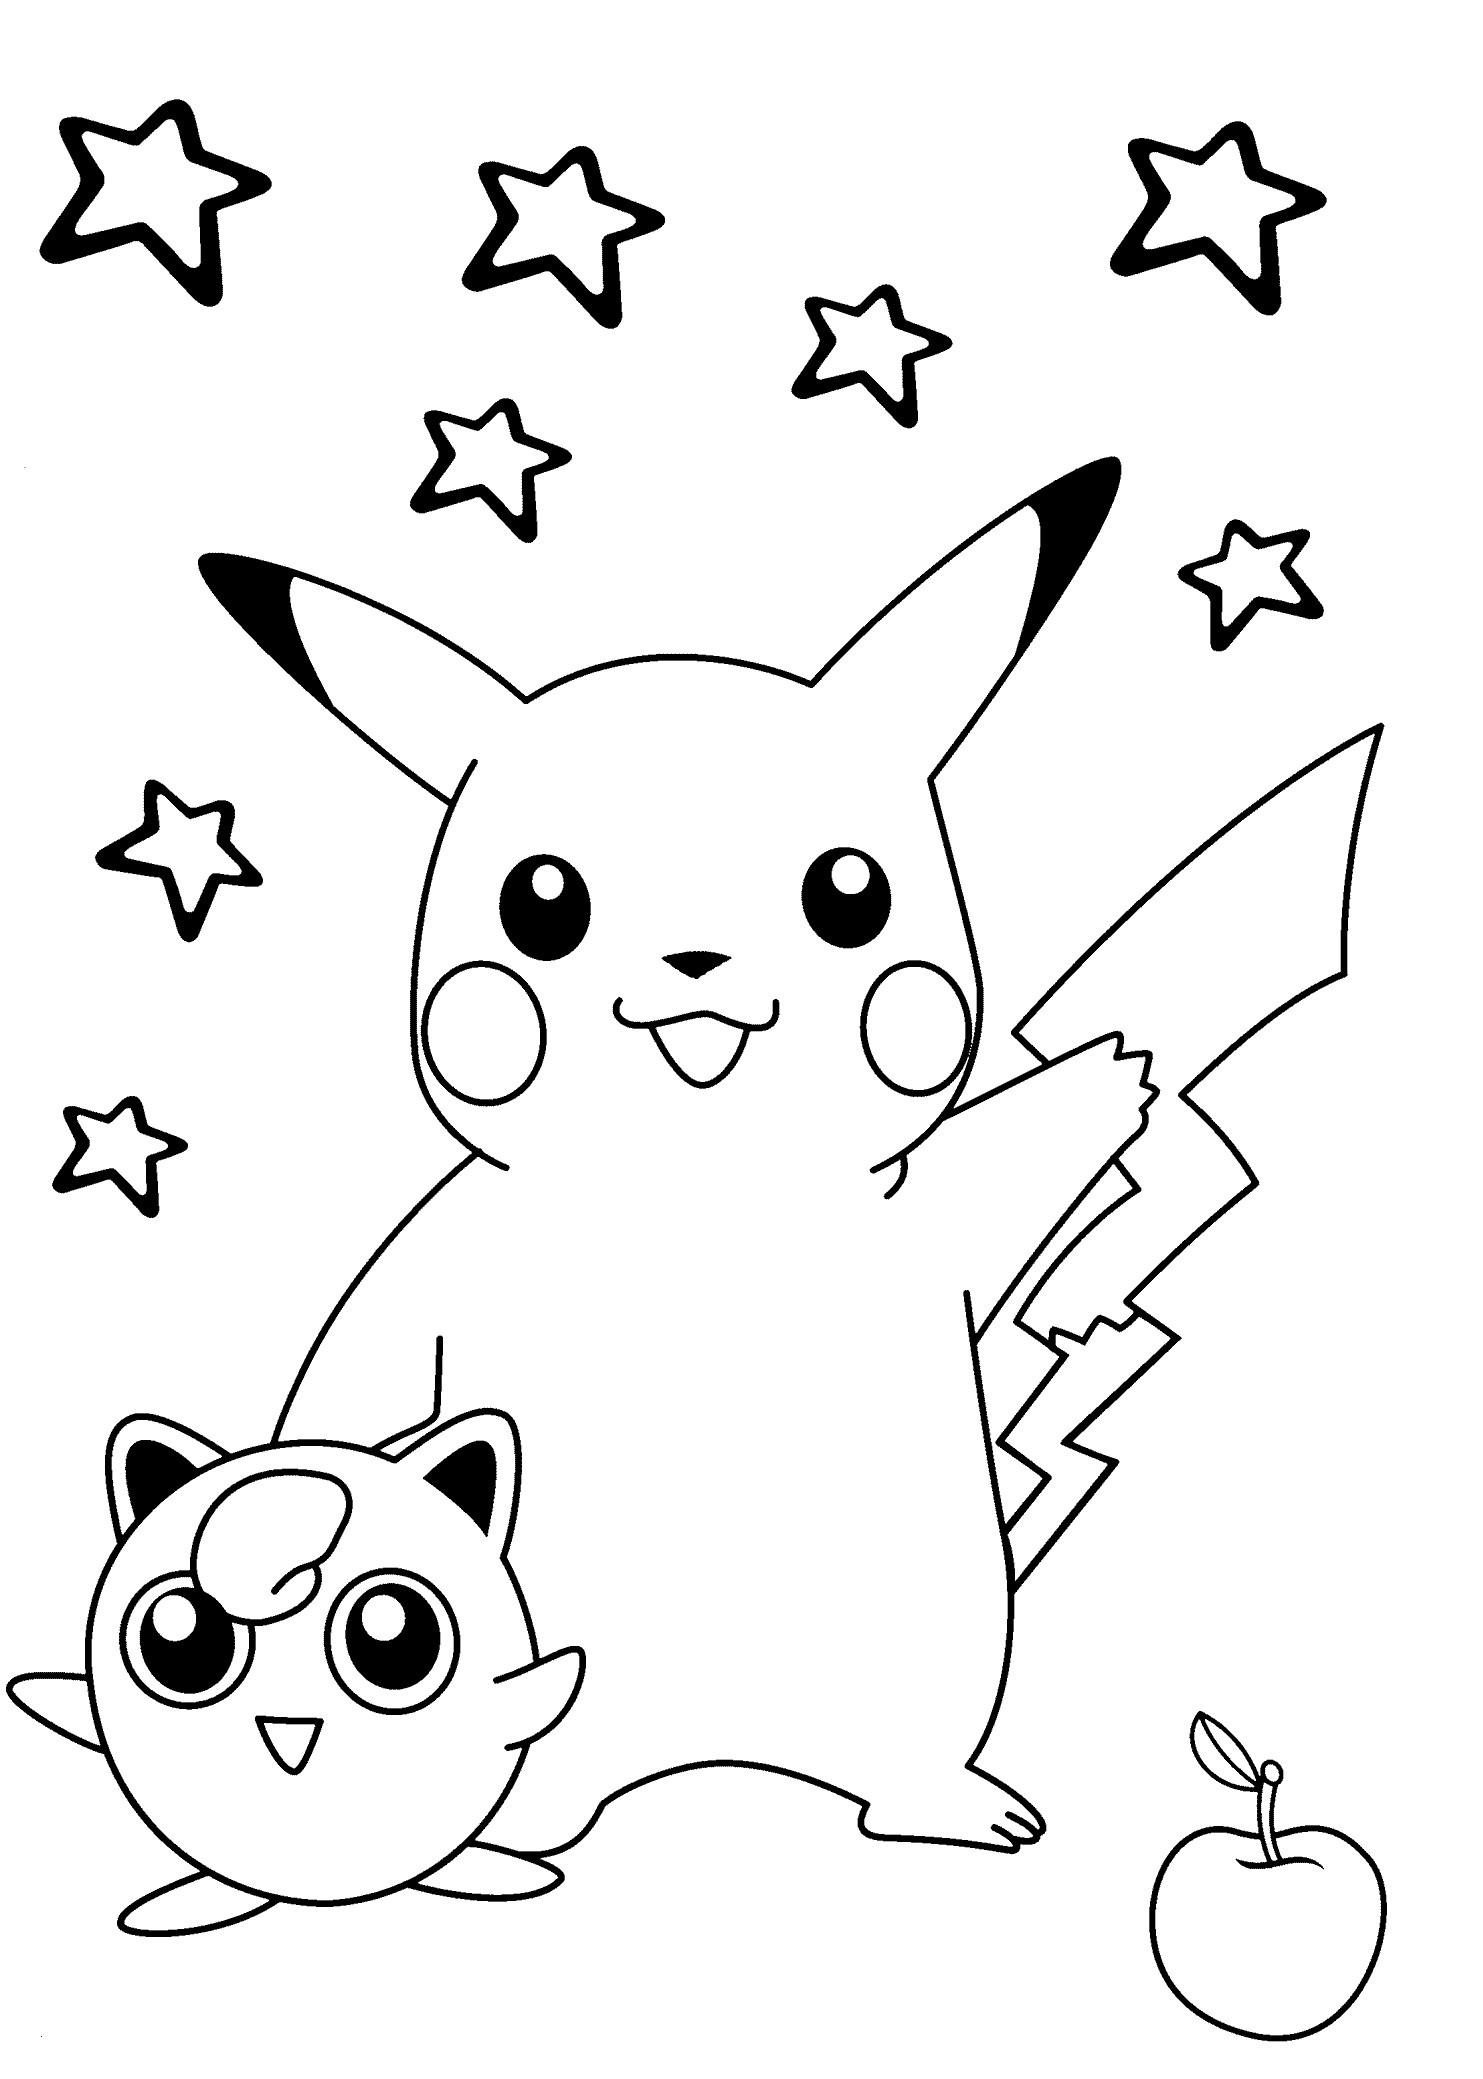 Cupcake Zum Ausmalen Genial Smiling Pokemon Coloring Pages for Kids Printable Free Best Das Bild